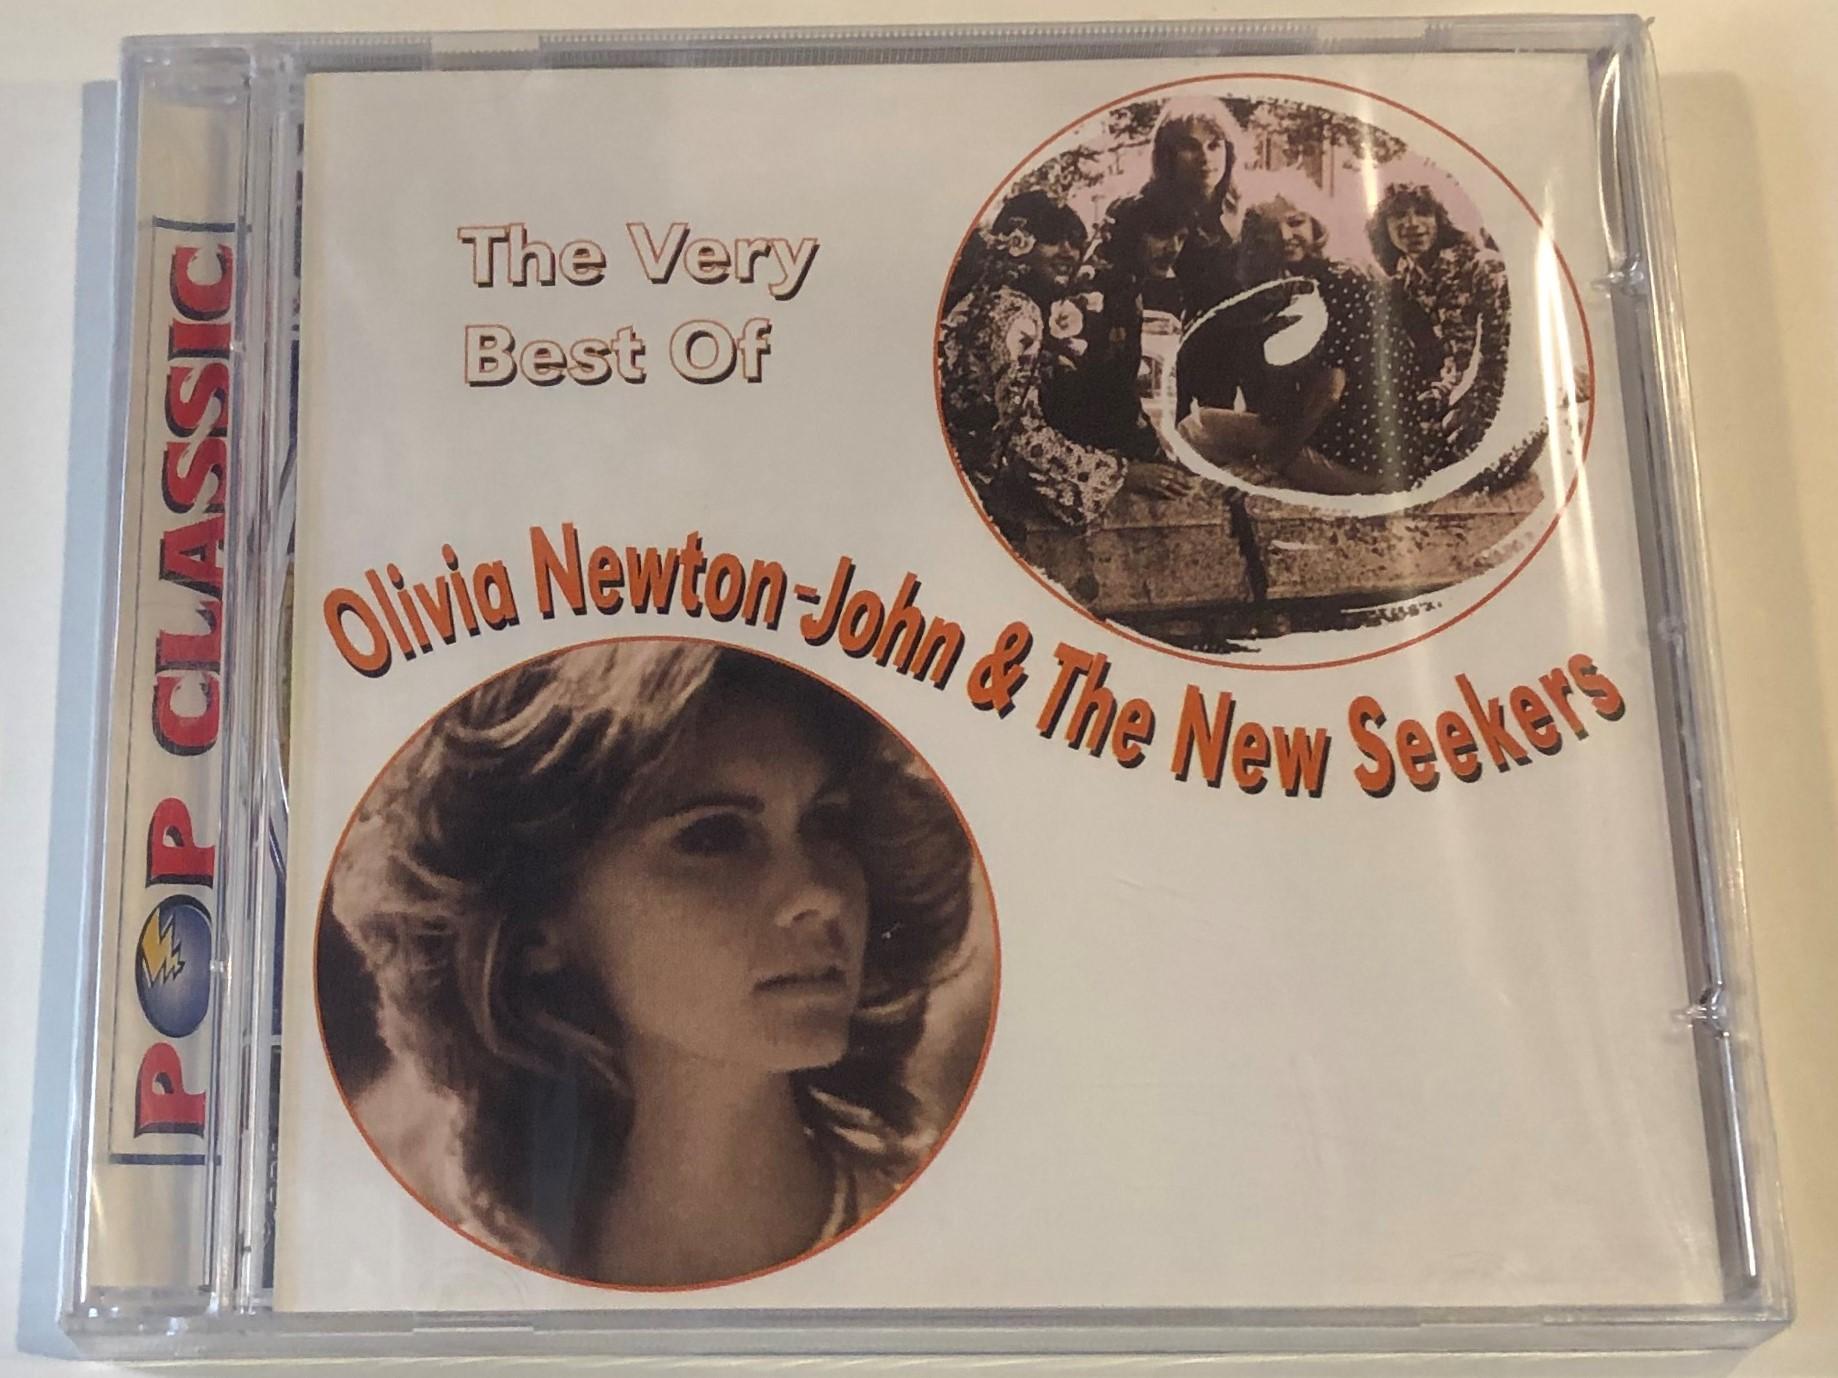 the-very-best-of-olivia-newton-john-the-new-seekers-pop-classic-audio-cd-5998490701413-1-.jpg